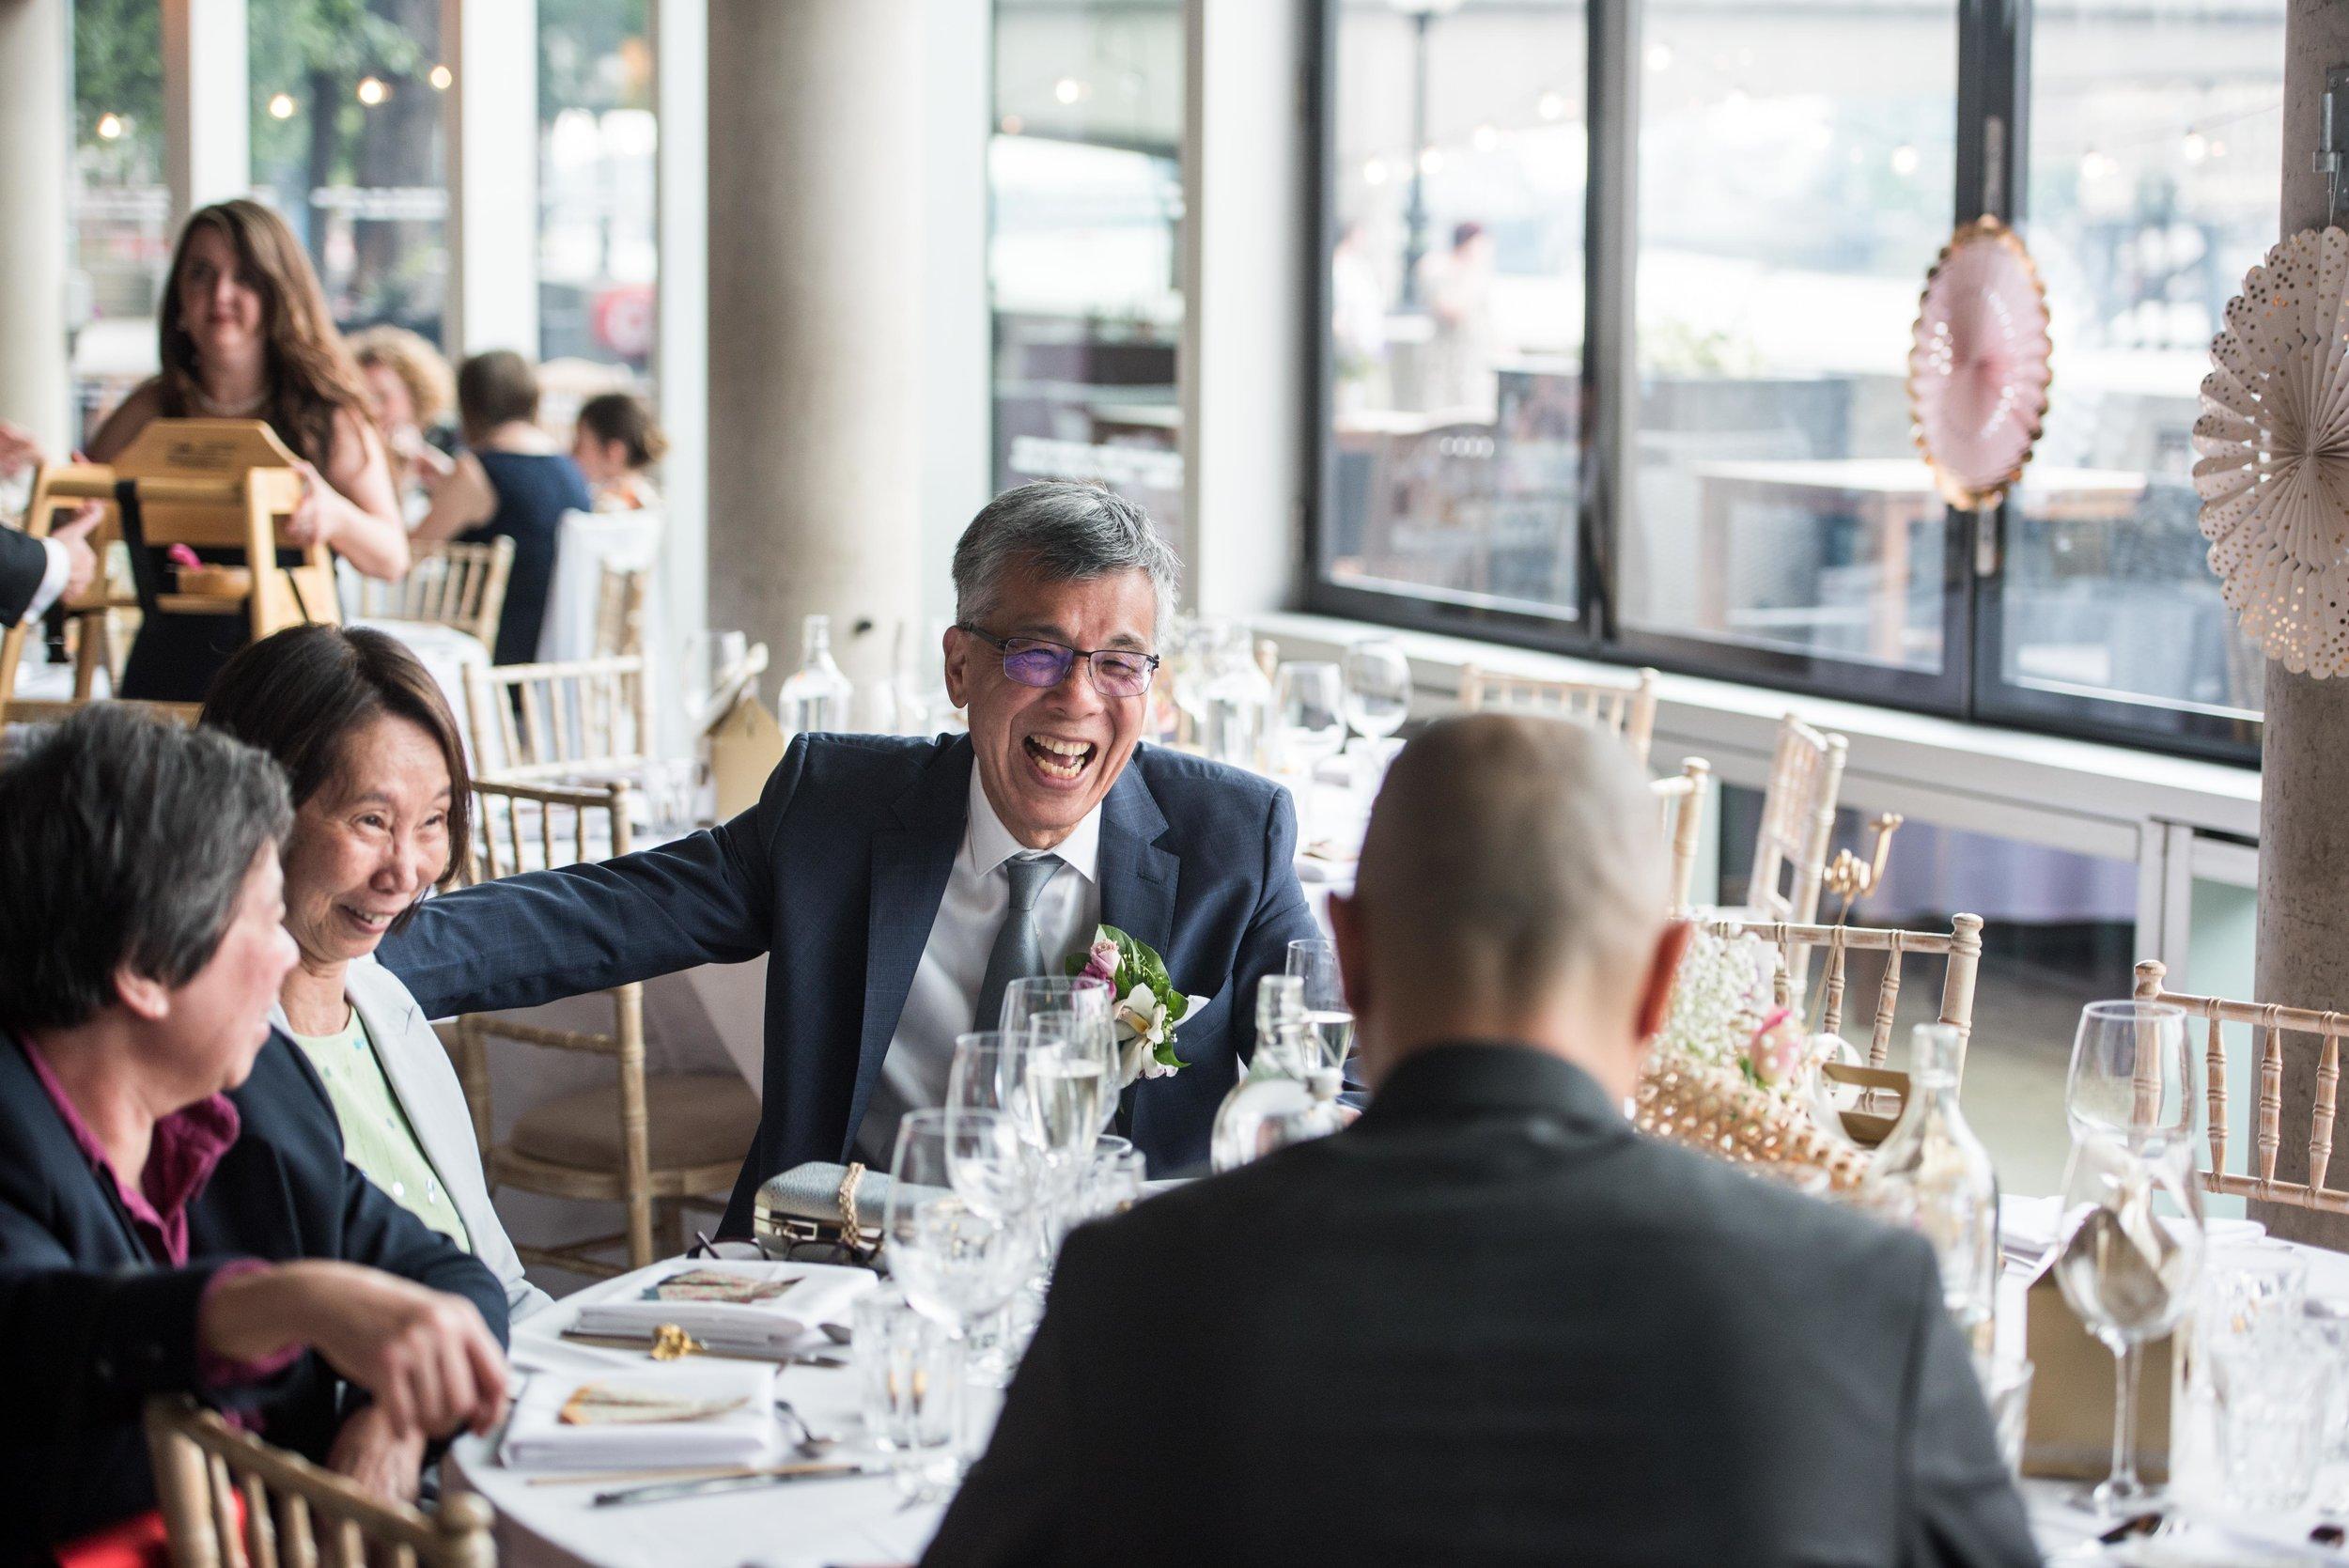 D&M_Marylebone Town Hall Wedding (218 of 239).jpg